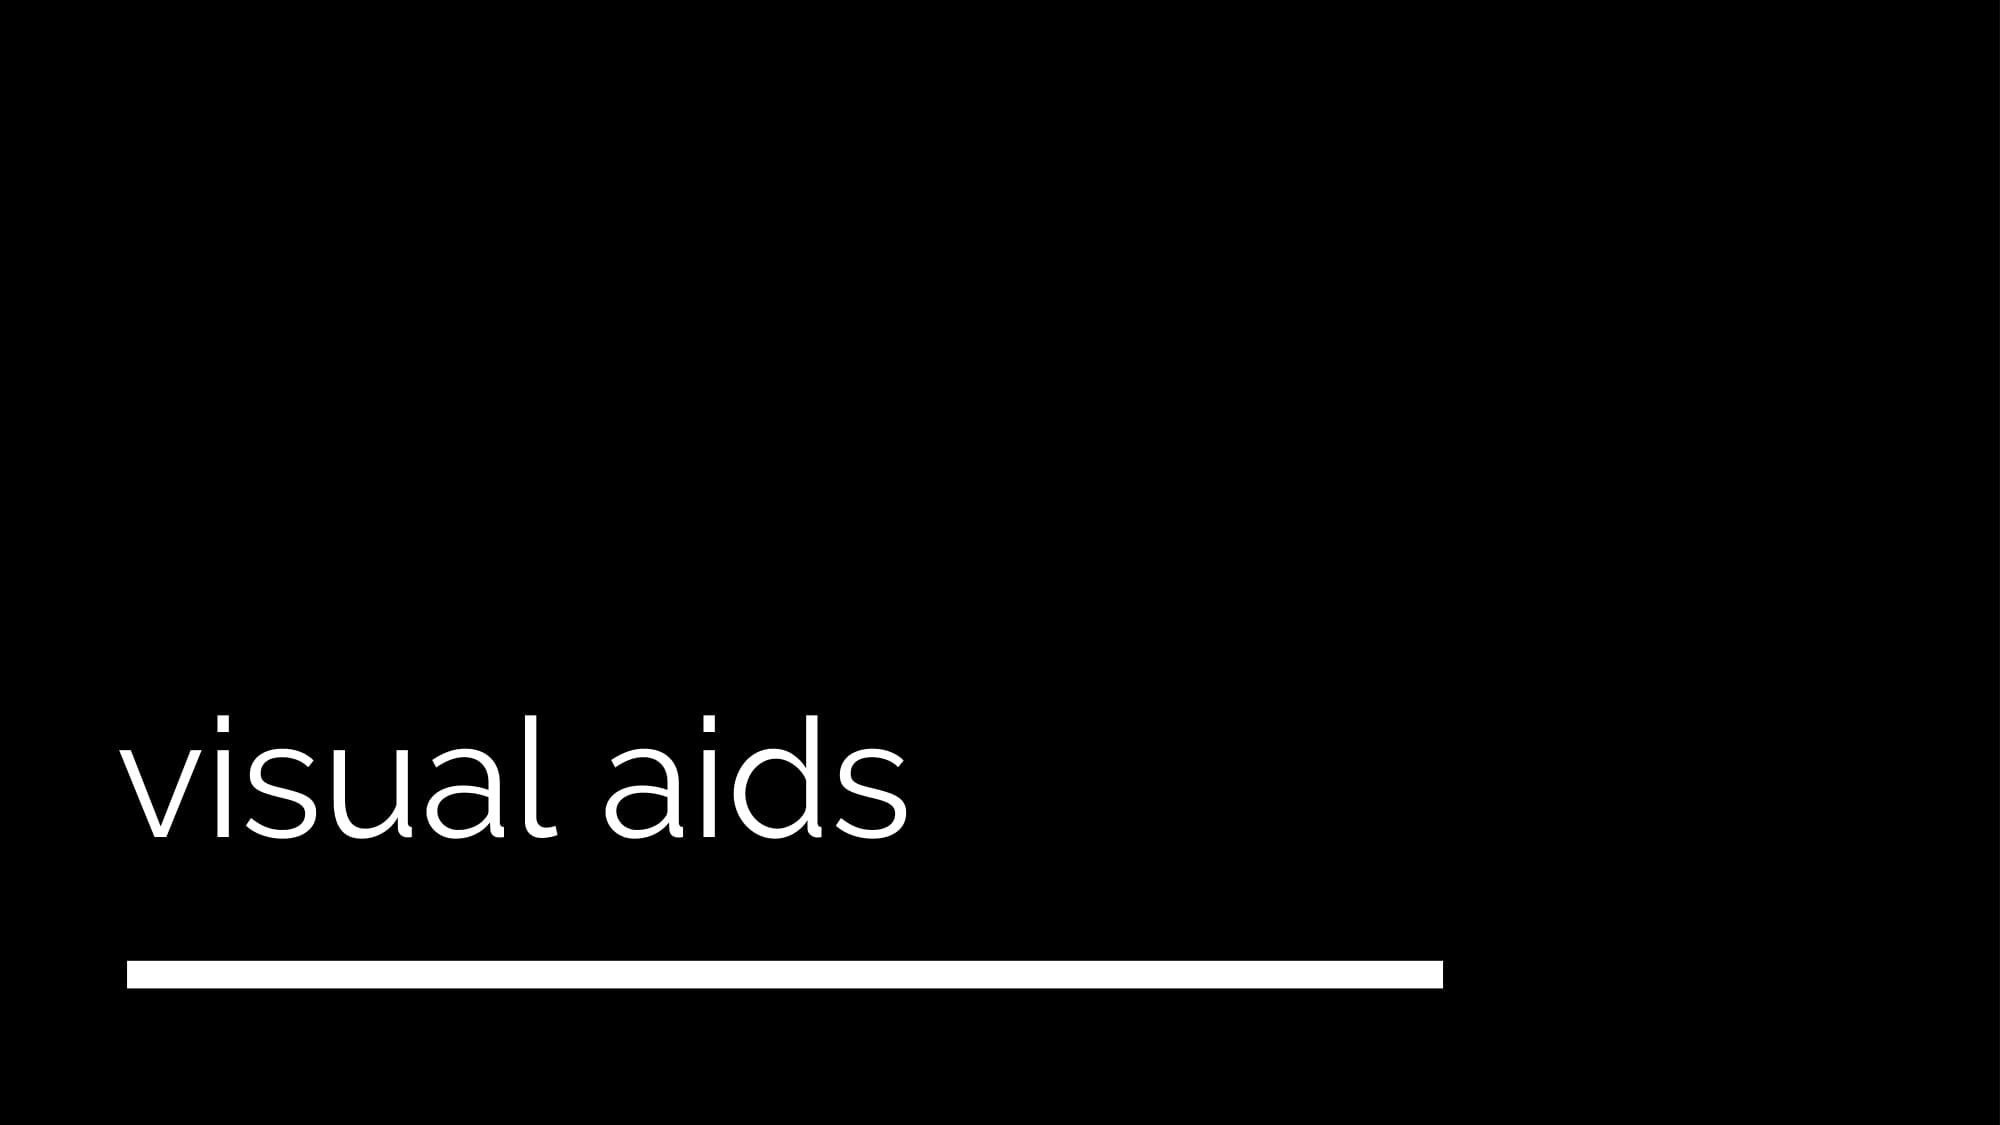 [3] Visual Aids-01.jpg